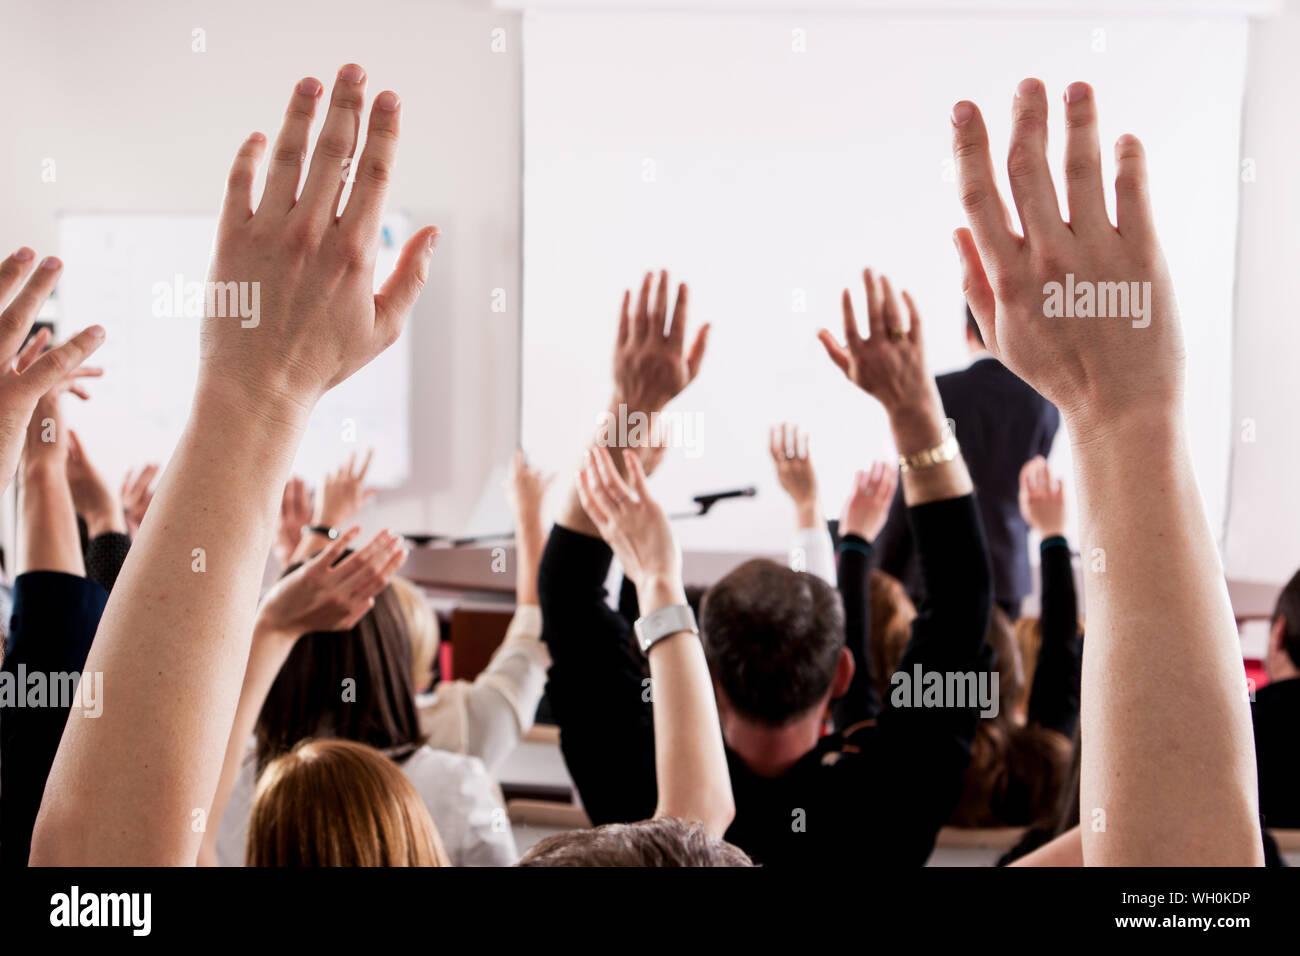 People With Arms raised in Lecture Hall au cours de séminaire Banque D'Images